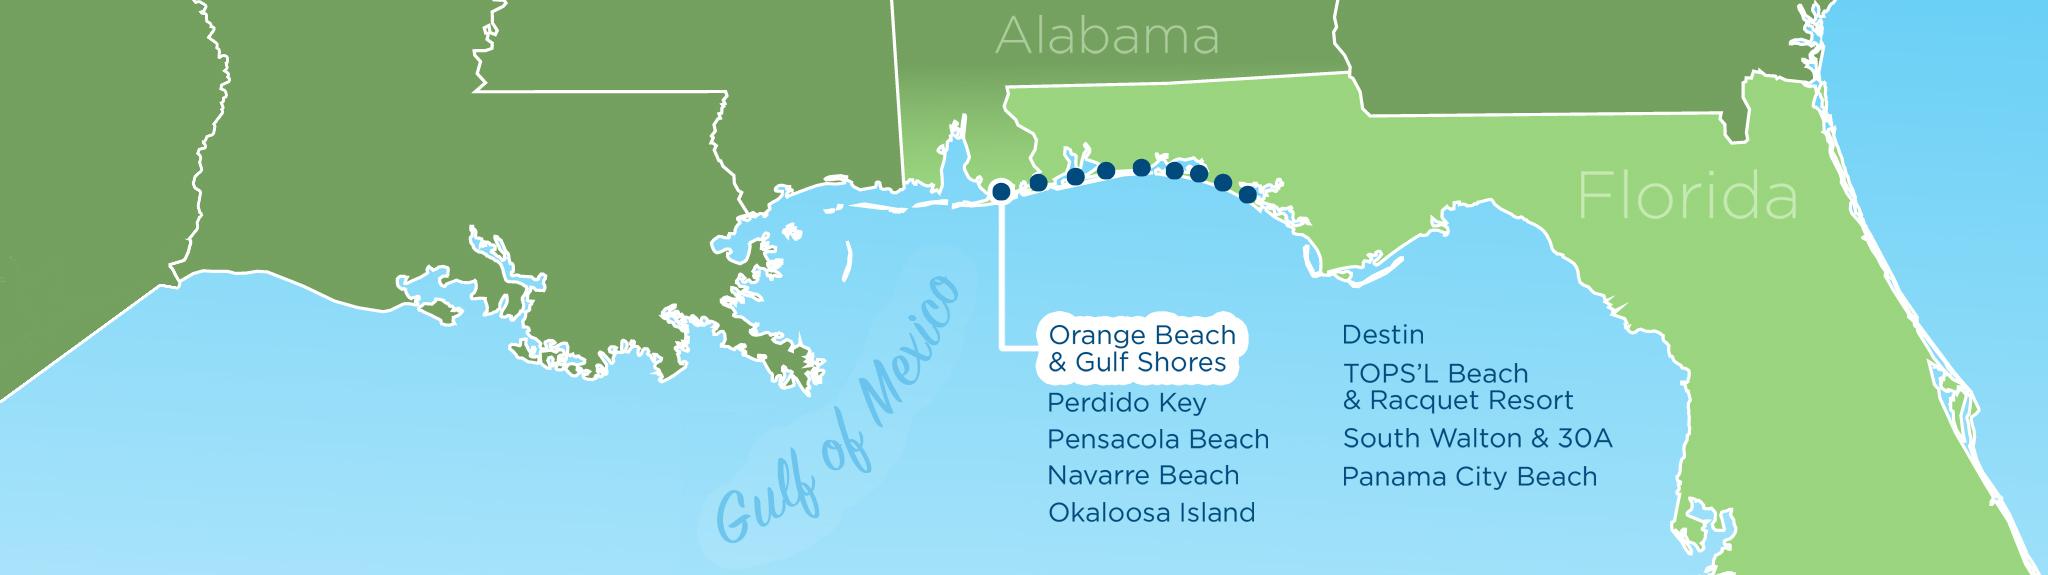 Resortquest Real Estate | Nw Fl & Al Gulf Coast Condos And Homes For - Map Of Destin Florida Area